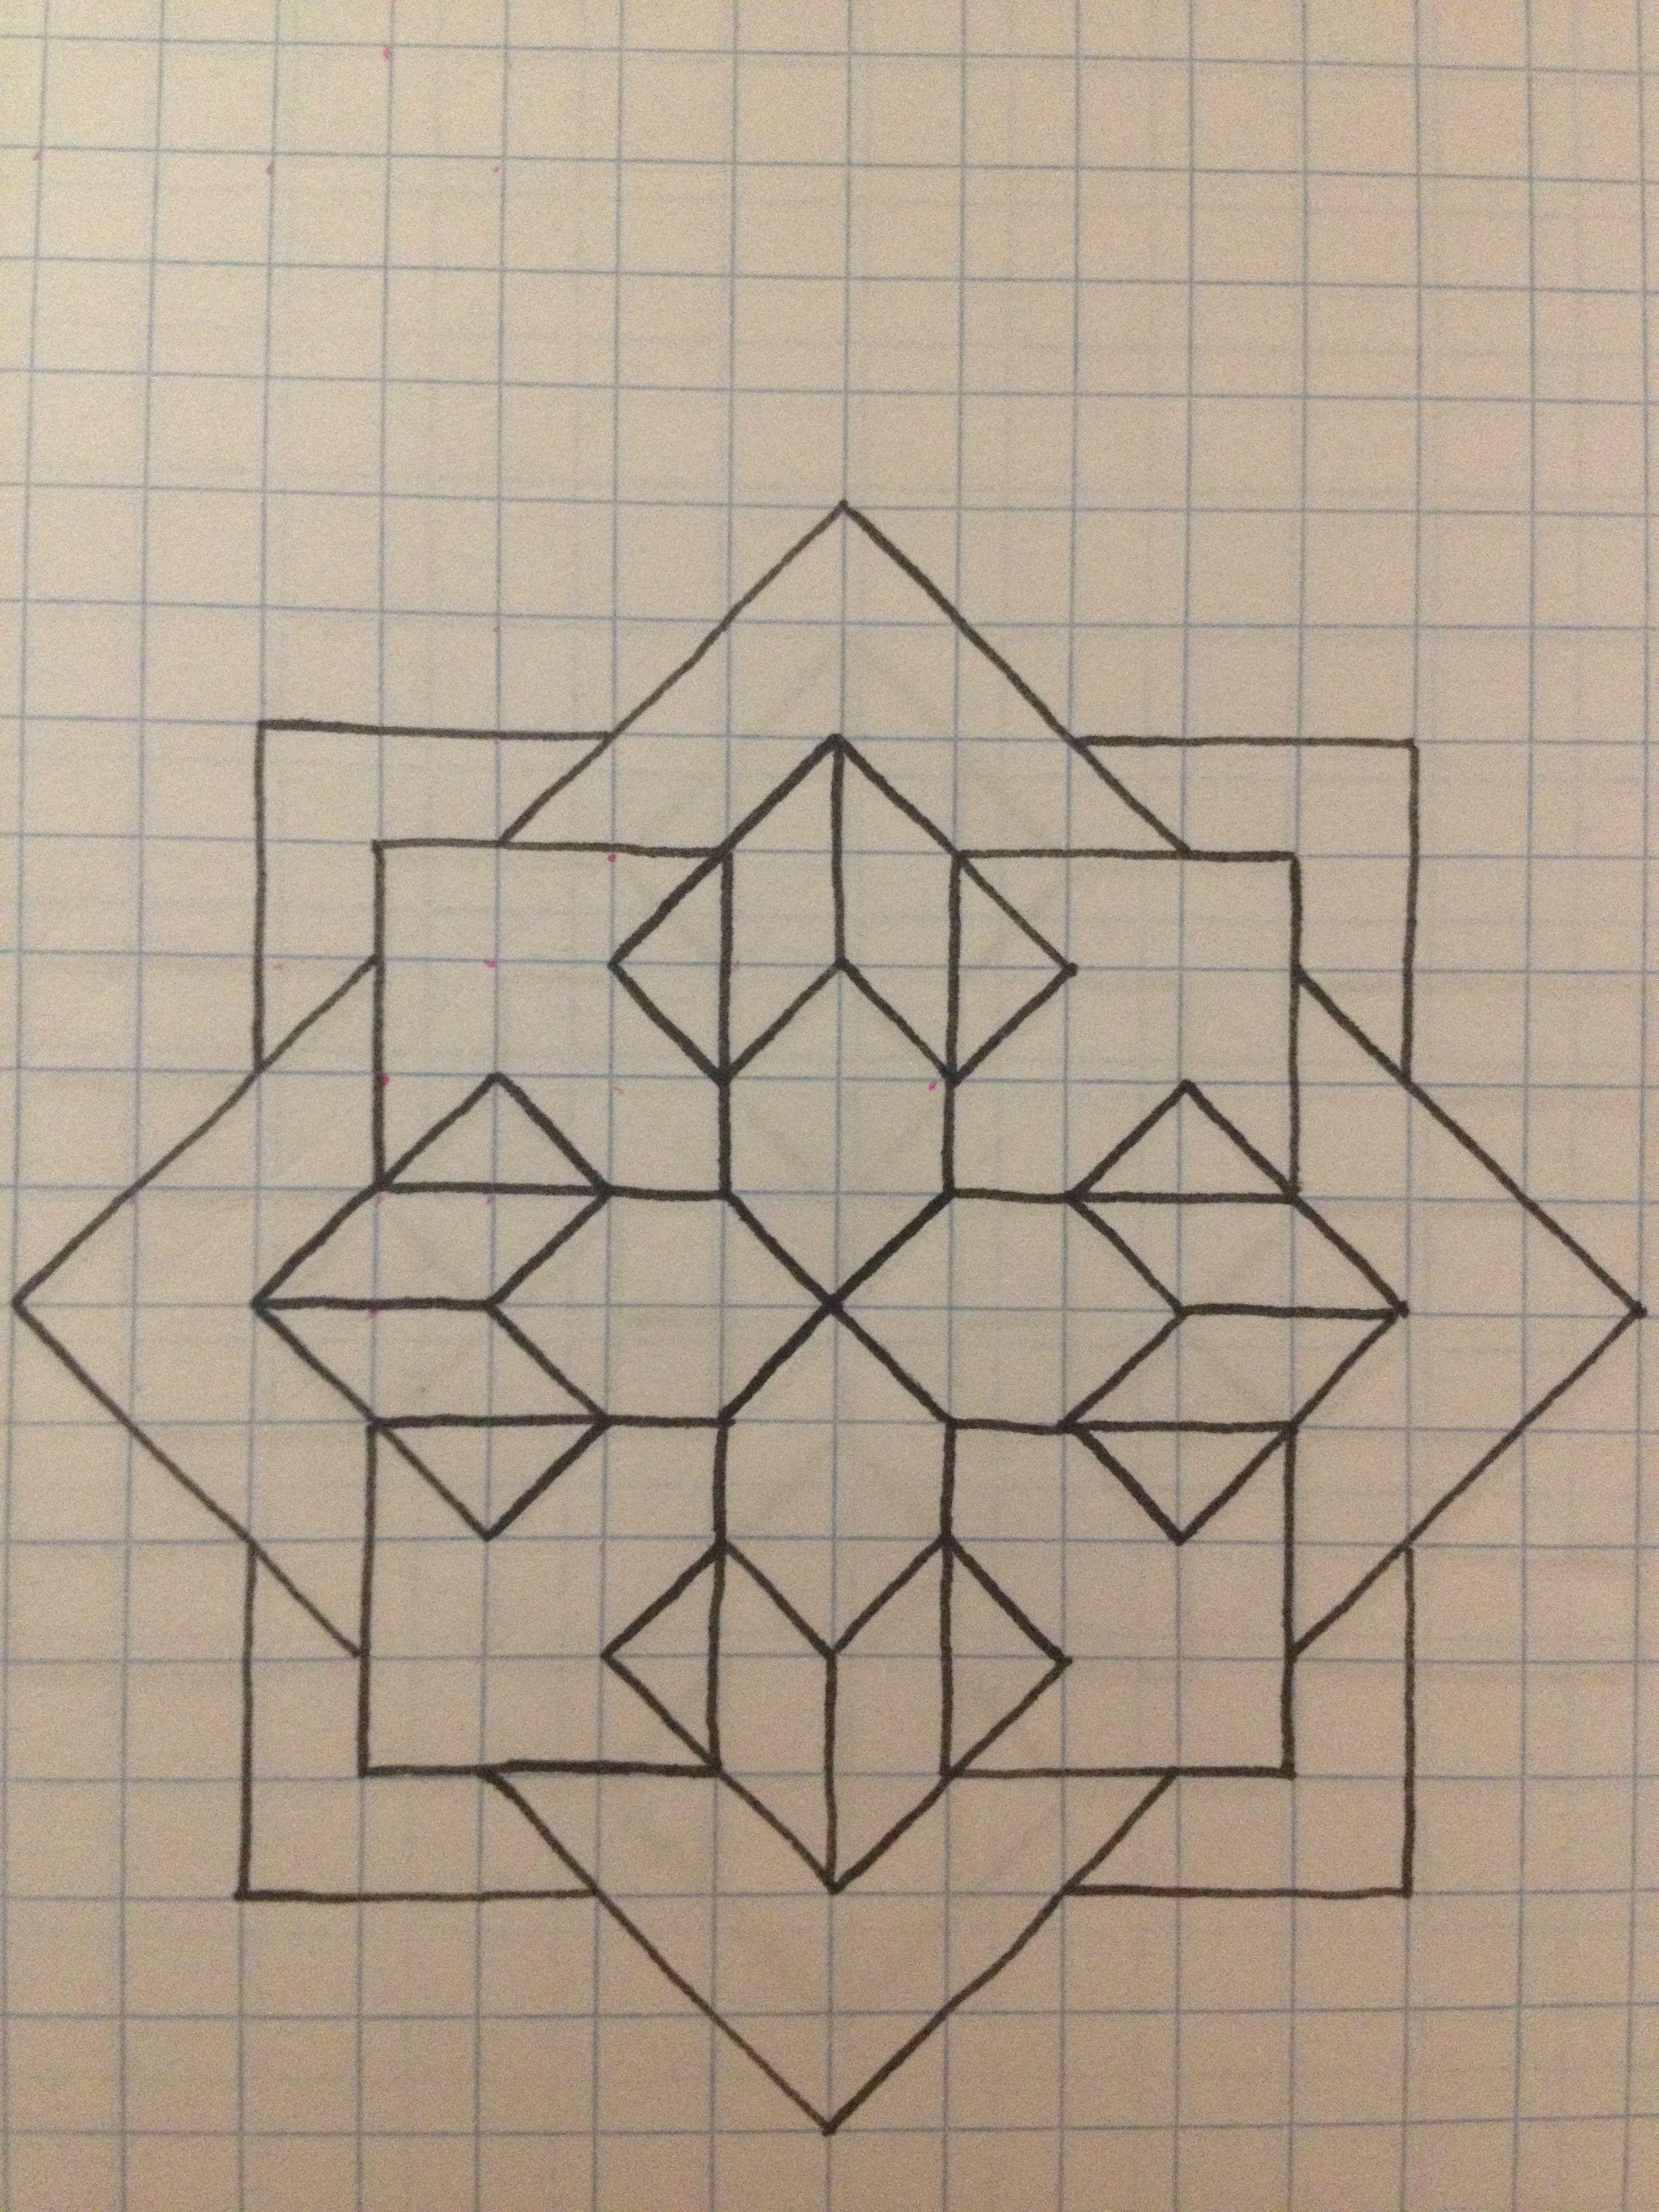 New Grid Paper Drawings Xlstemplate Xlsformats